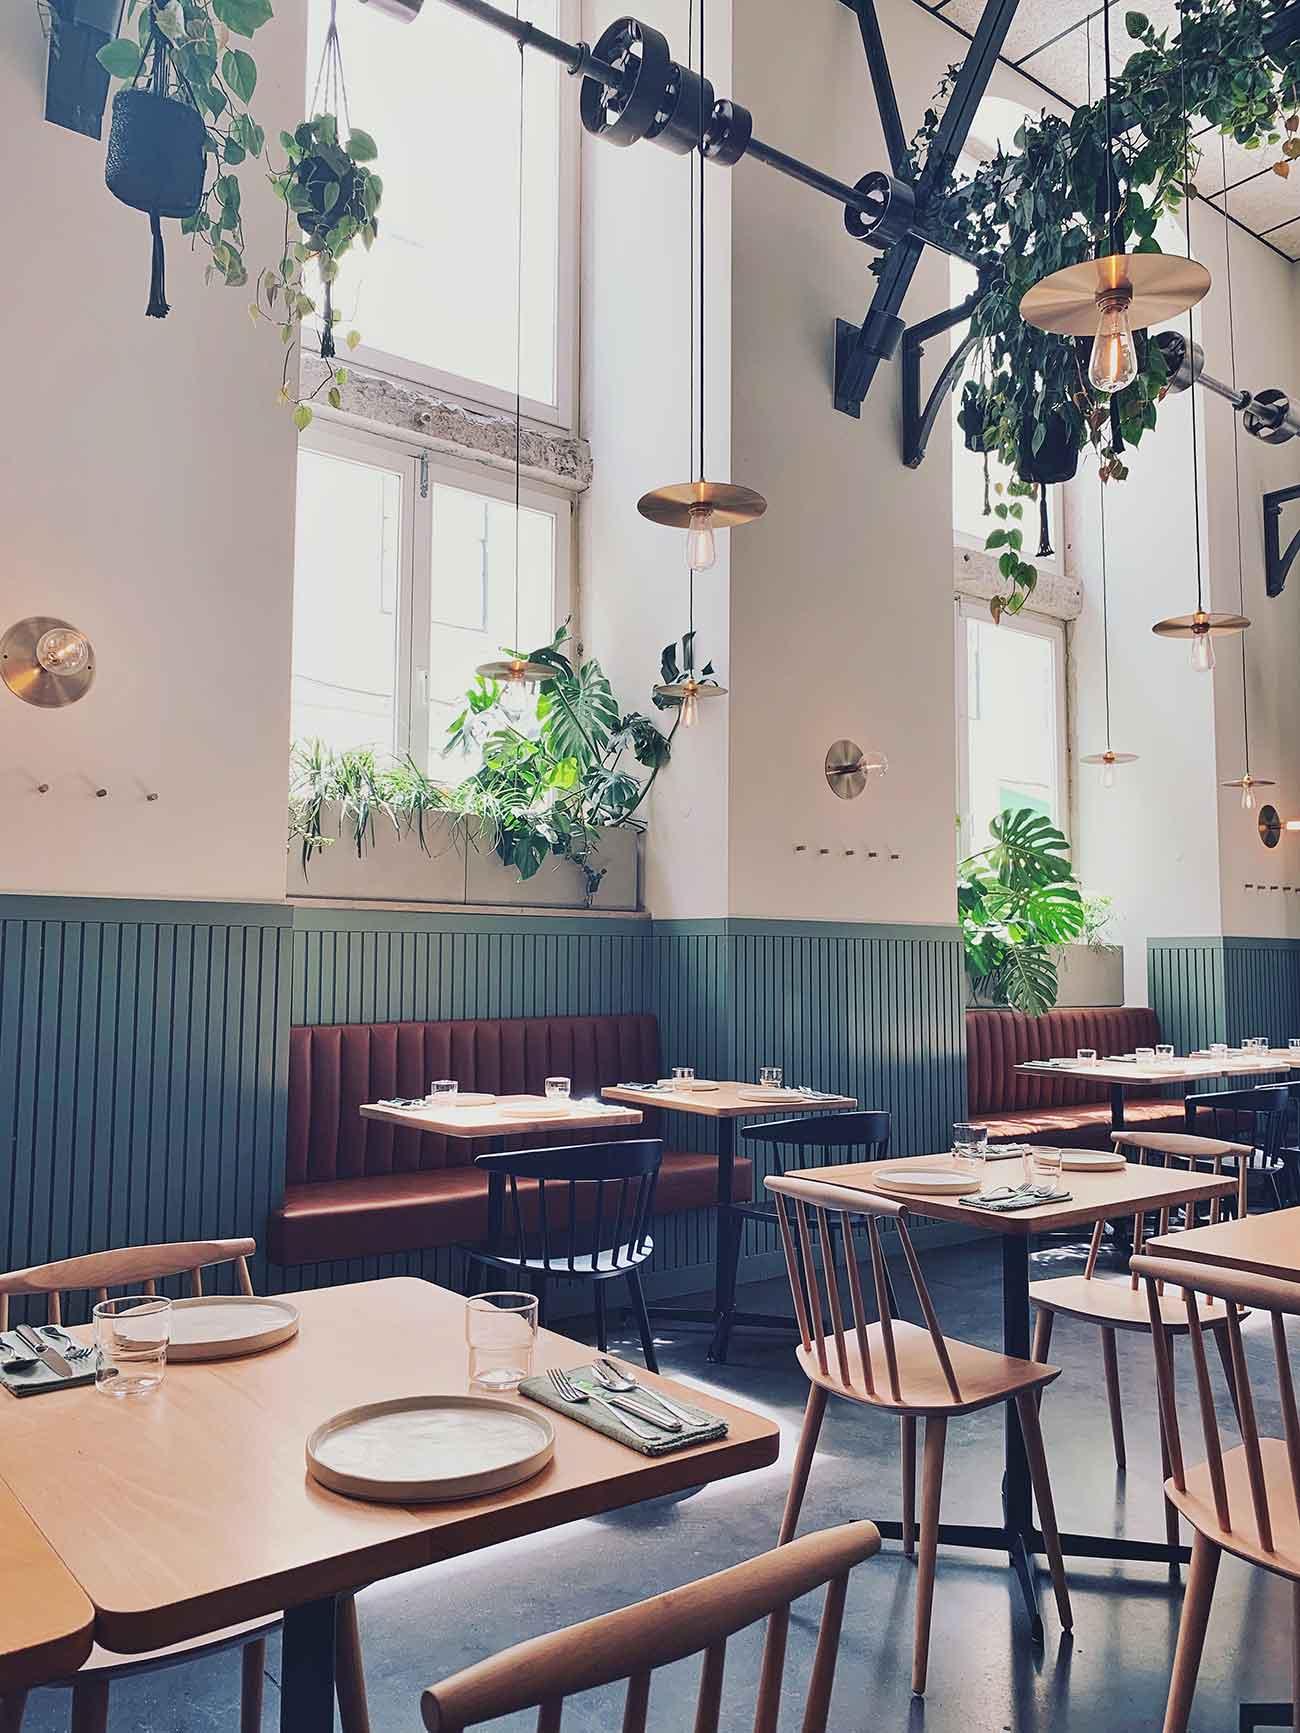 Prado Lisbon - Where to eat in Lisbon interior